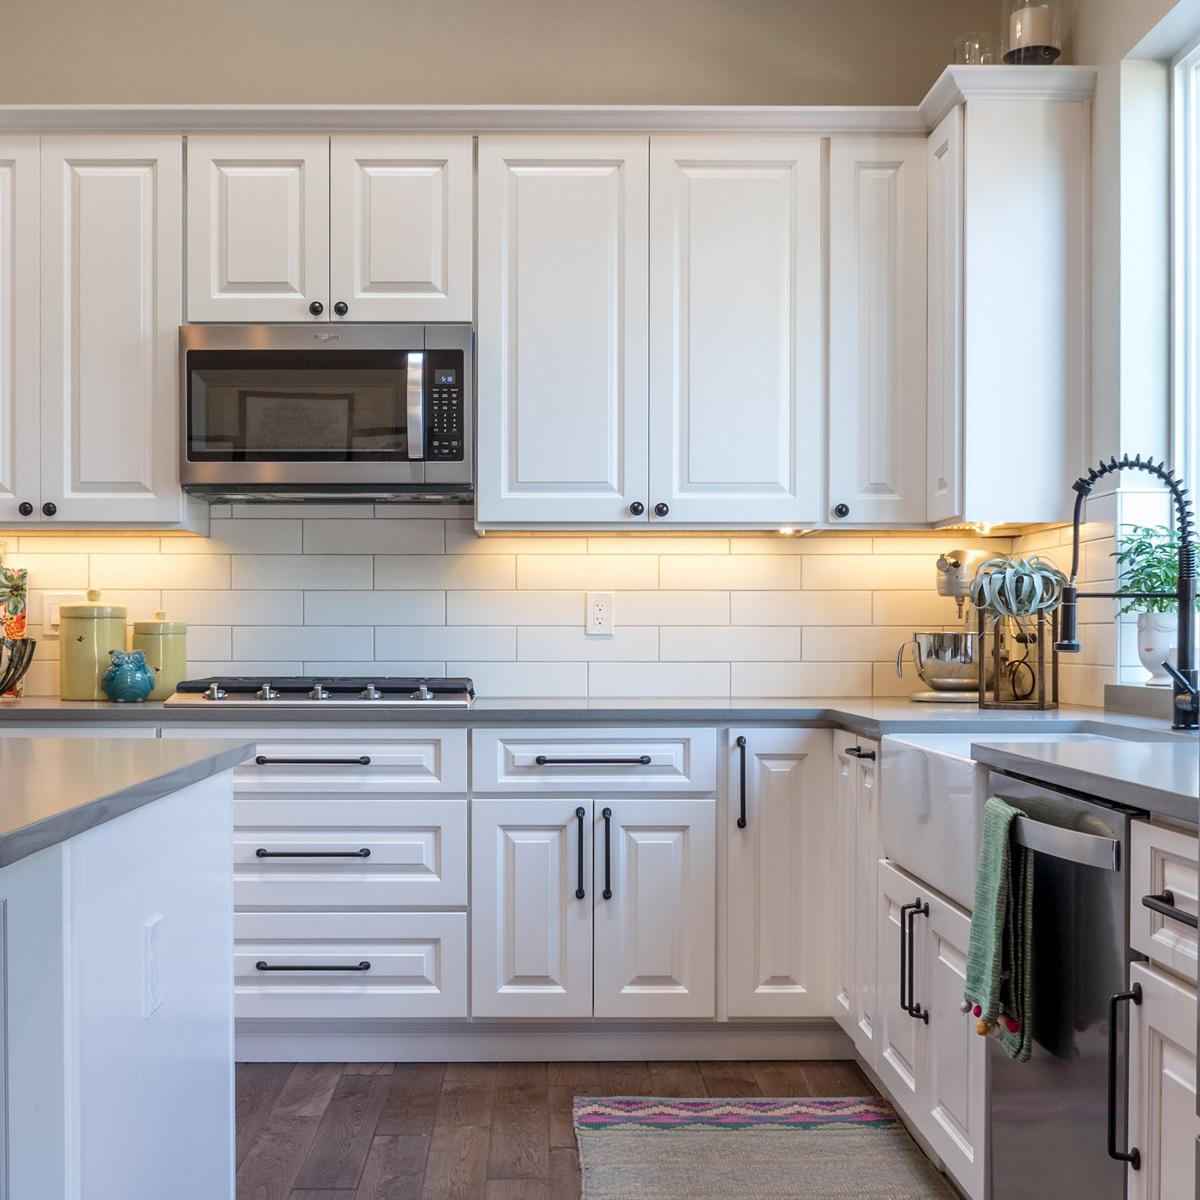 _1960407-HDR-Kitchen-Corner.jpg